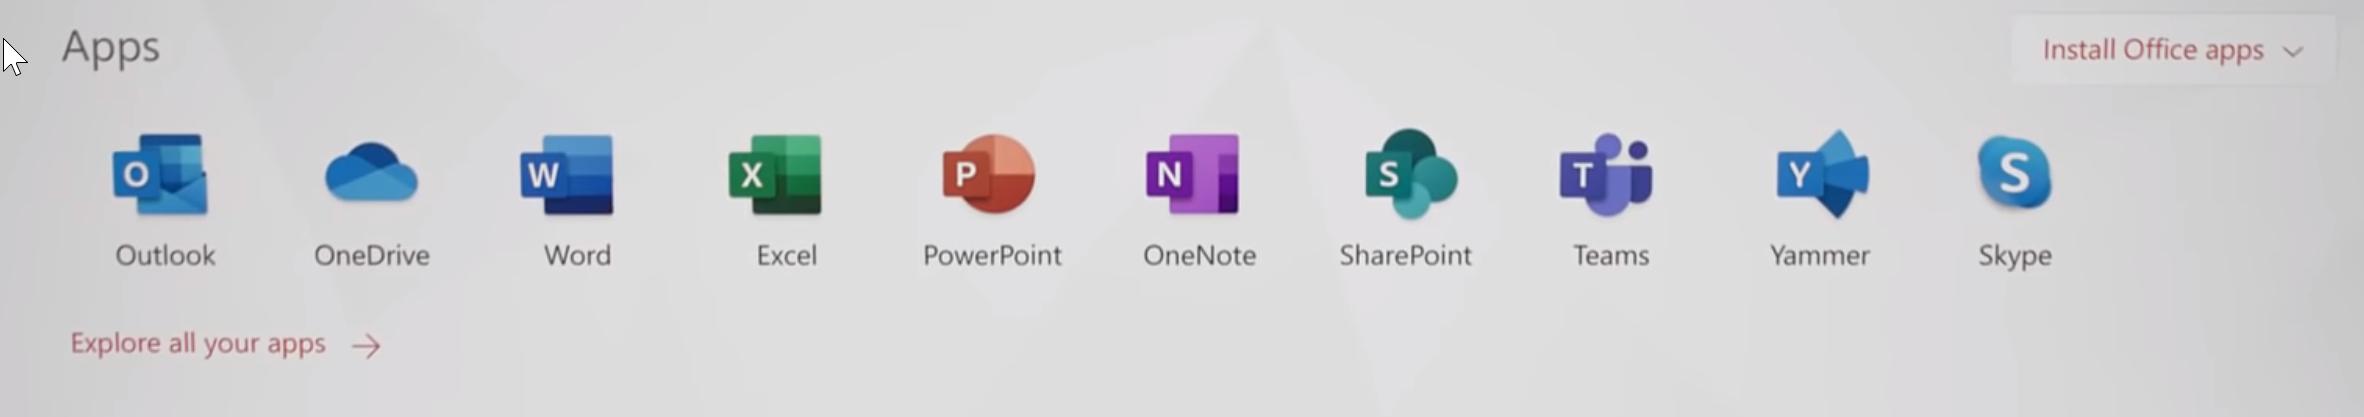 Office bekommt neue Icons: Microsoft modernisiert sein